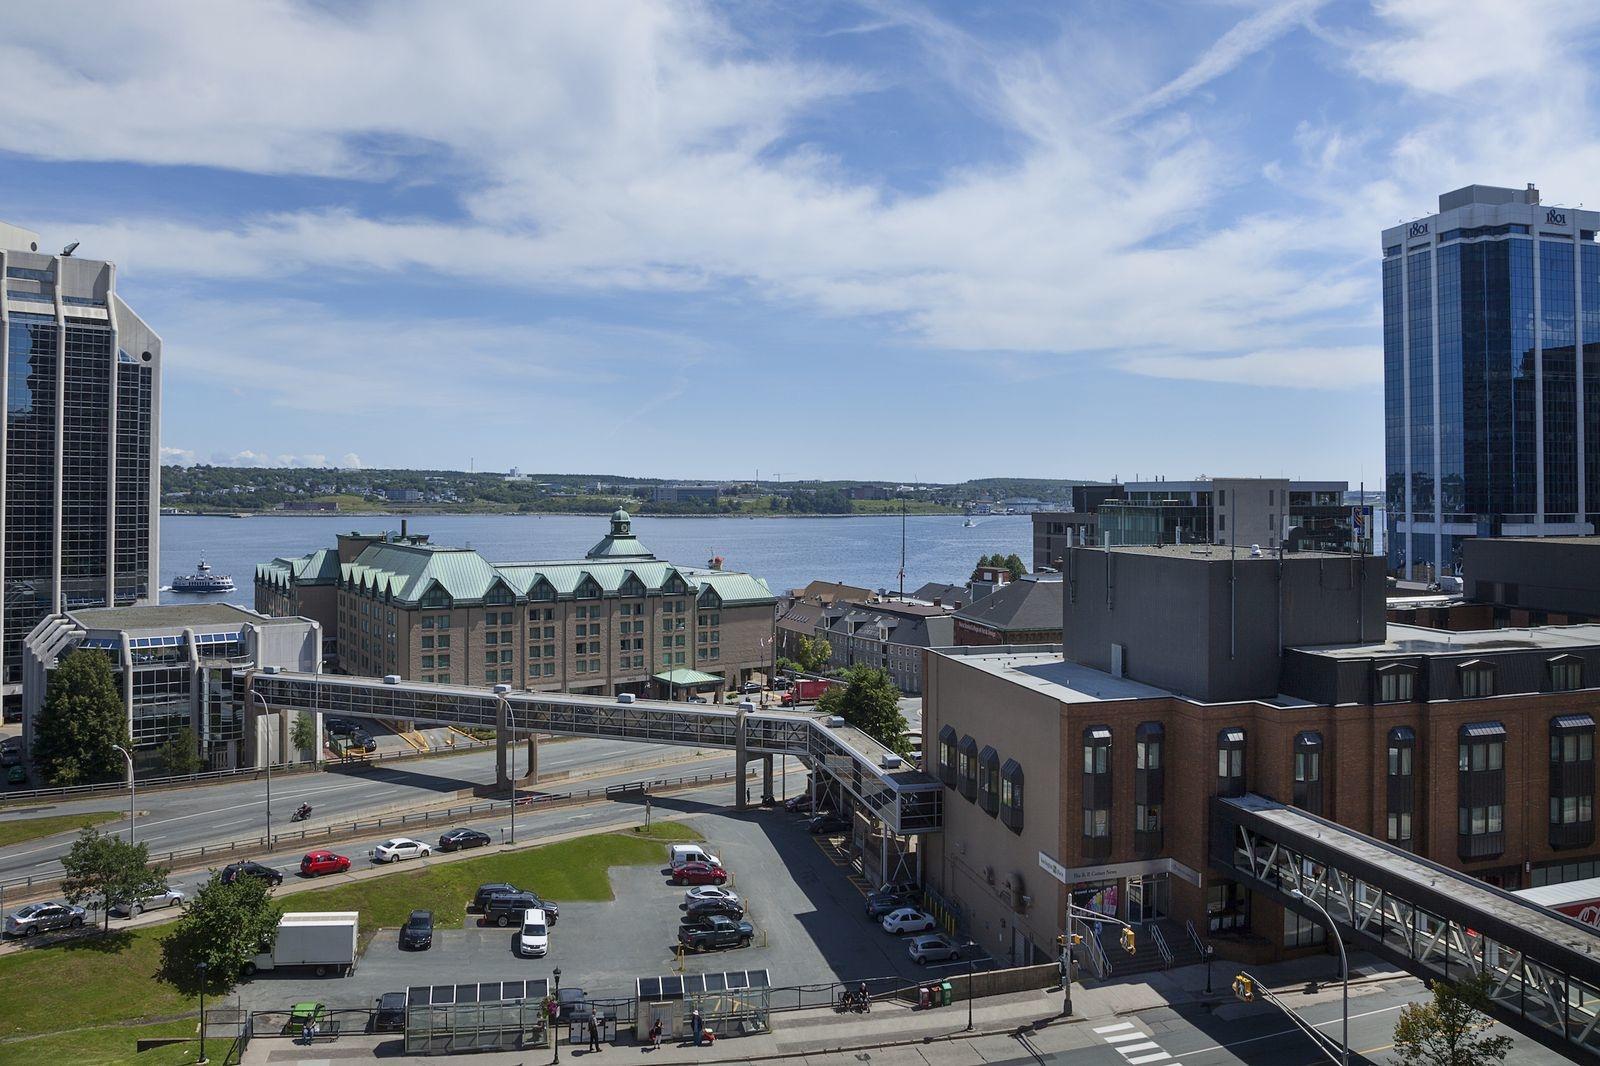 Hotel Halifax Habor View